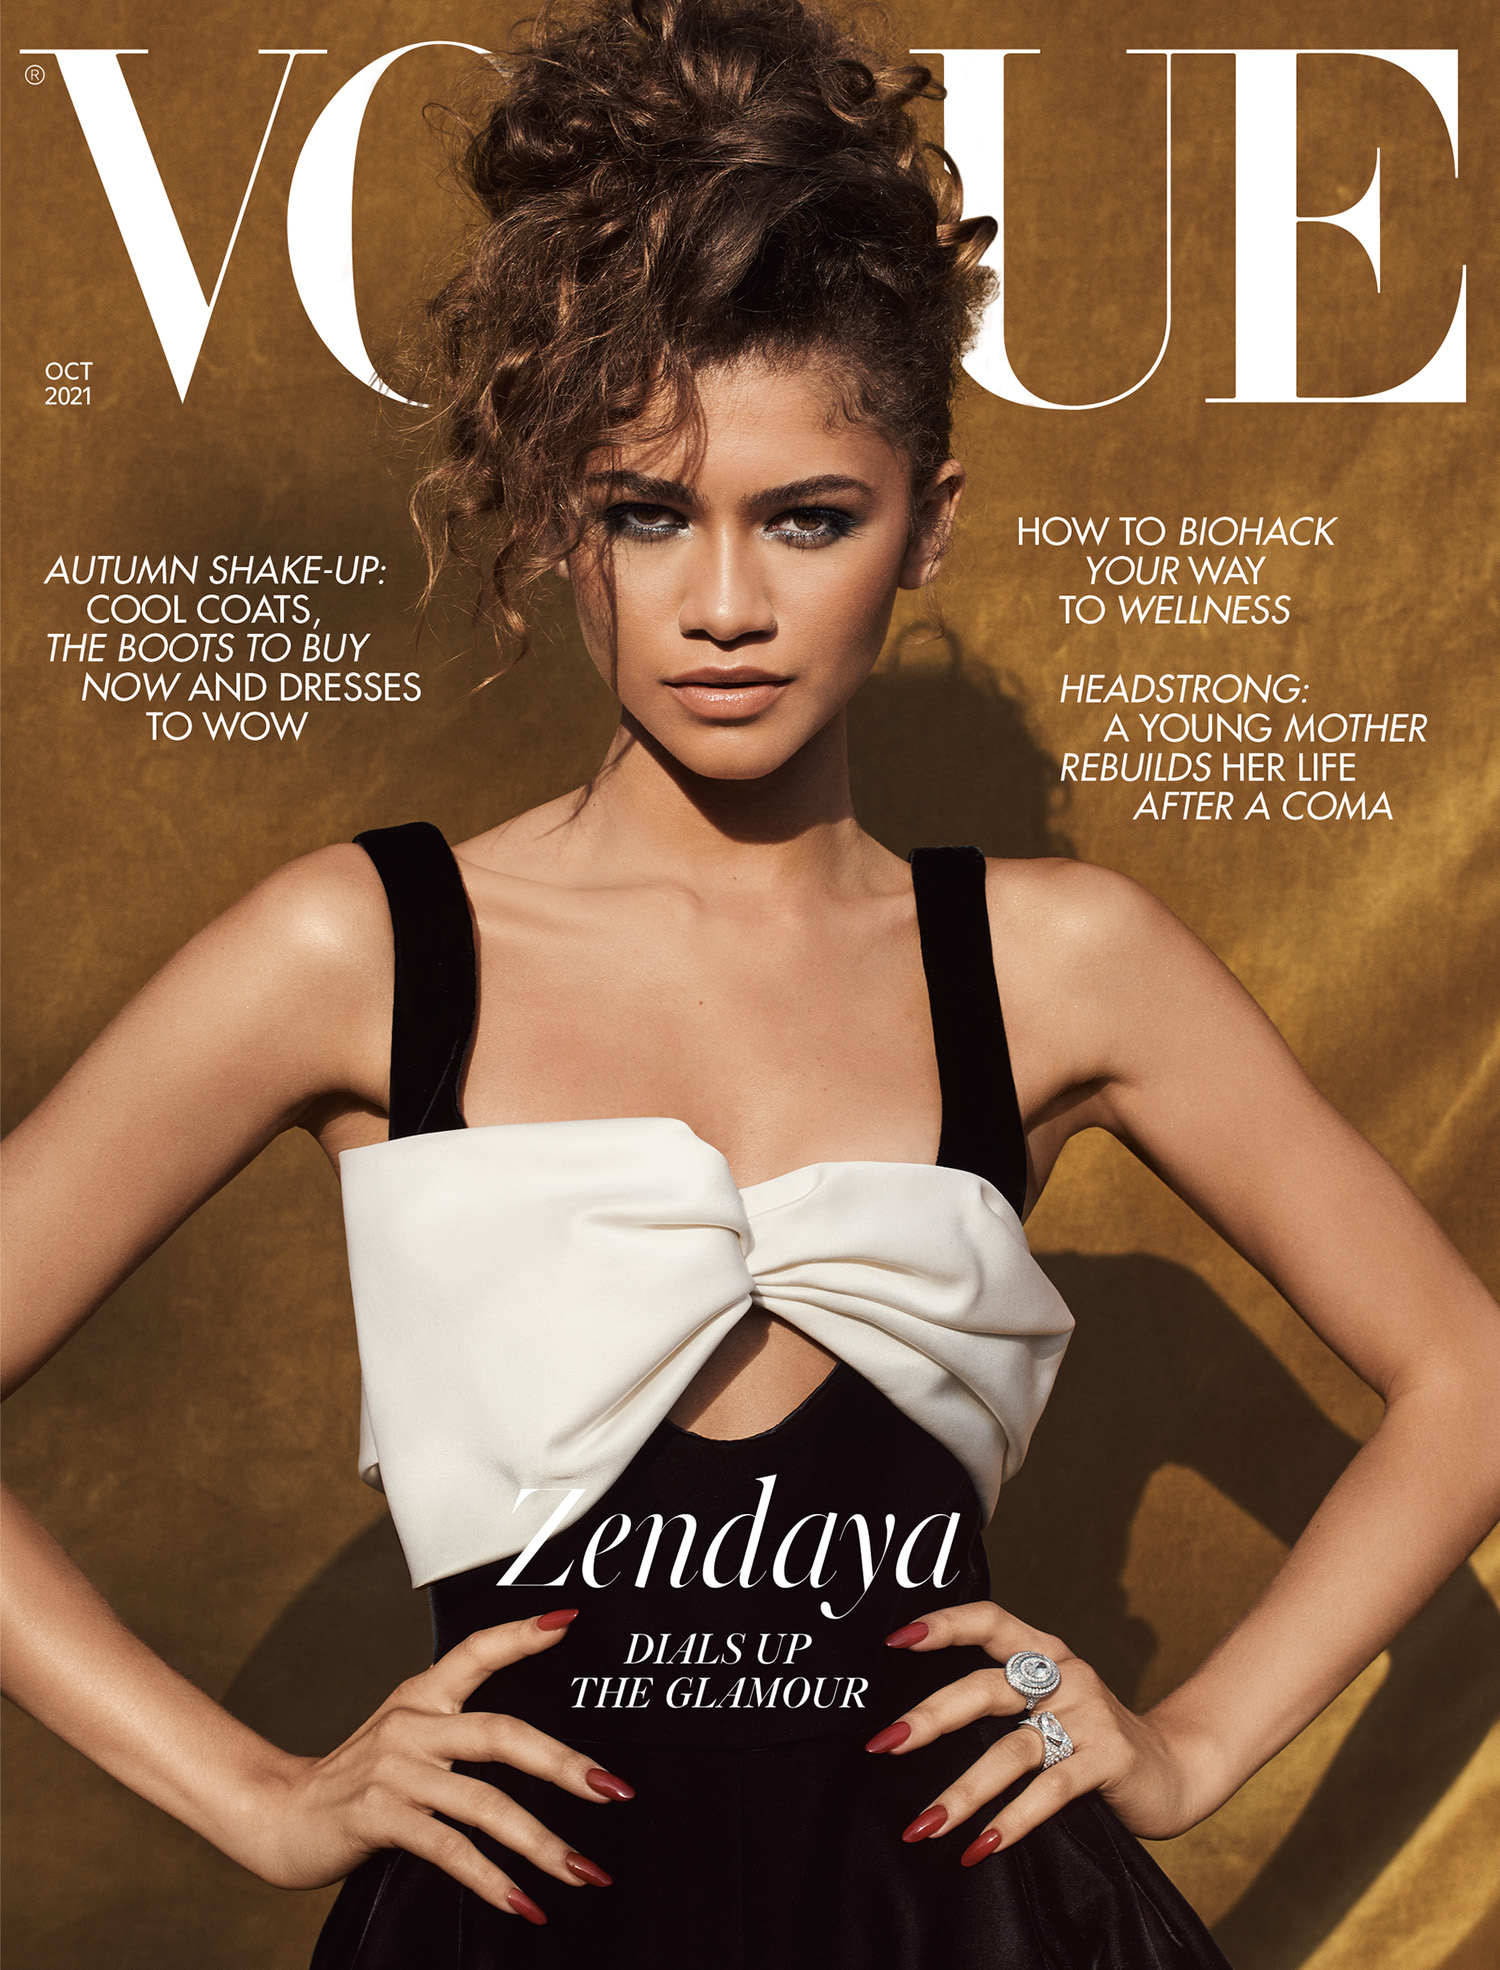 Zendaya covers British Vogue October 2021 by Craig McDean